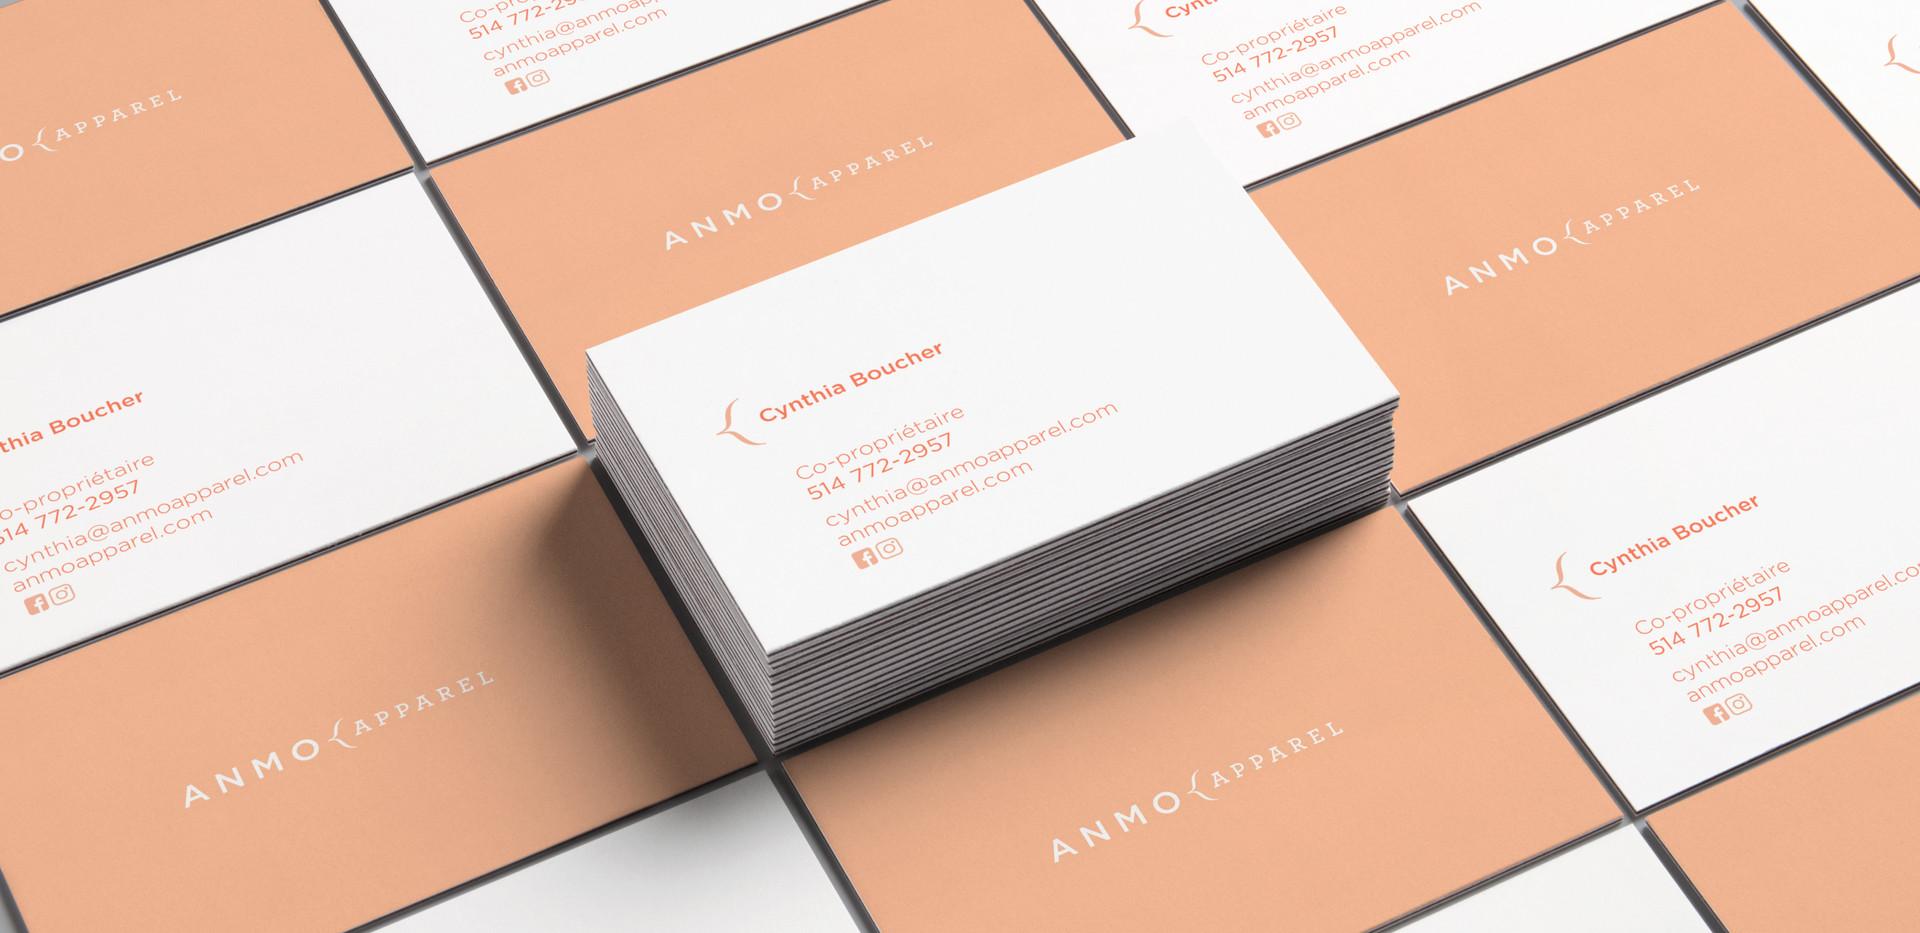 Amno | Cartes d'affaires